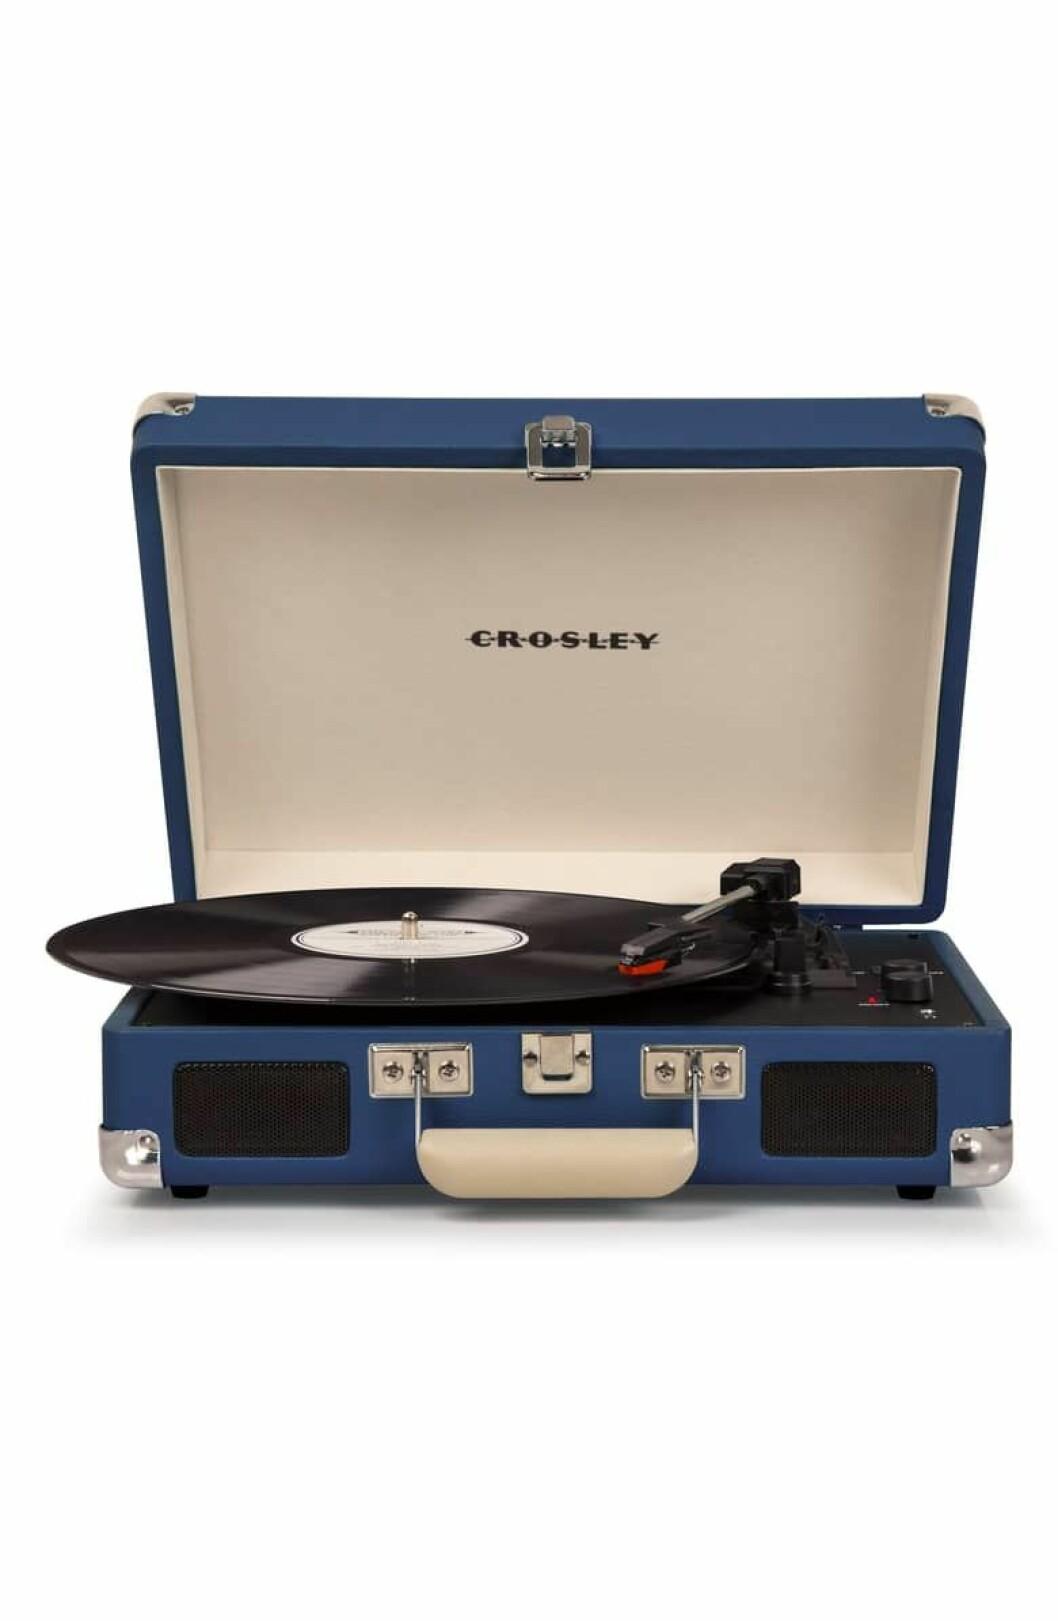 Cruiser Deluxe Turntable fra Crosley Radio |644,-| https://shop.nordstrom.com/s/crosley-radio-cruiser-deluxe-turntable/4644933?siteid=tv2R4u9rImY-mYt2x8kEa8KuQR3qWp.VWA&utm_source=rakuten&utm_medium=affiliate&utm_campaign=tv2R4u9rImY&utm_content=1&utm_term=593370&utm_channel=affiliate_ret_p&sp_source=rakuten&sp_campaign=tv2R4u9rImY